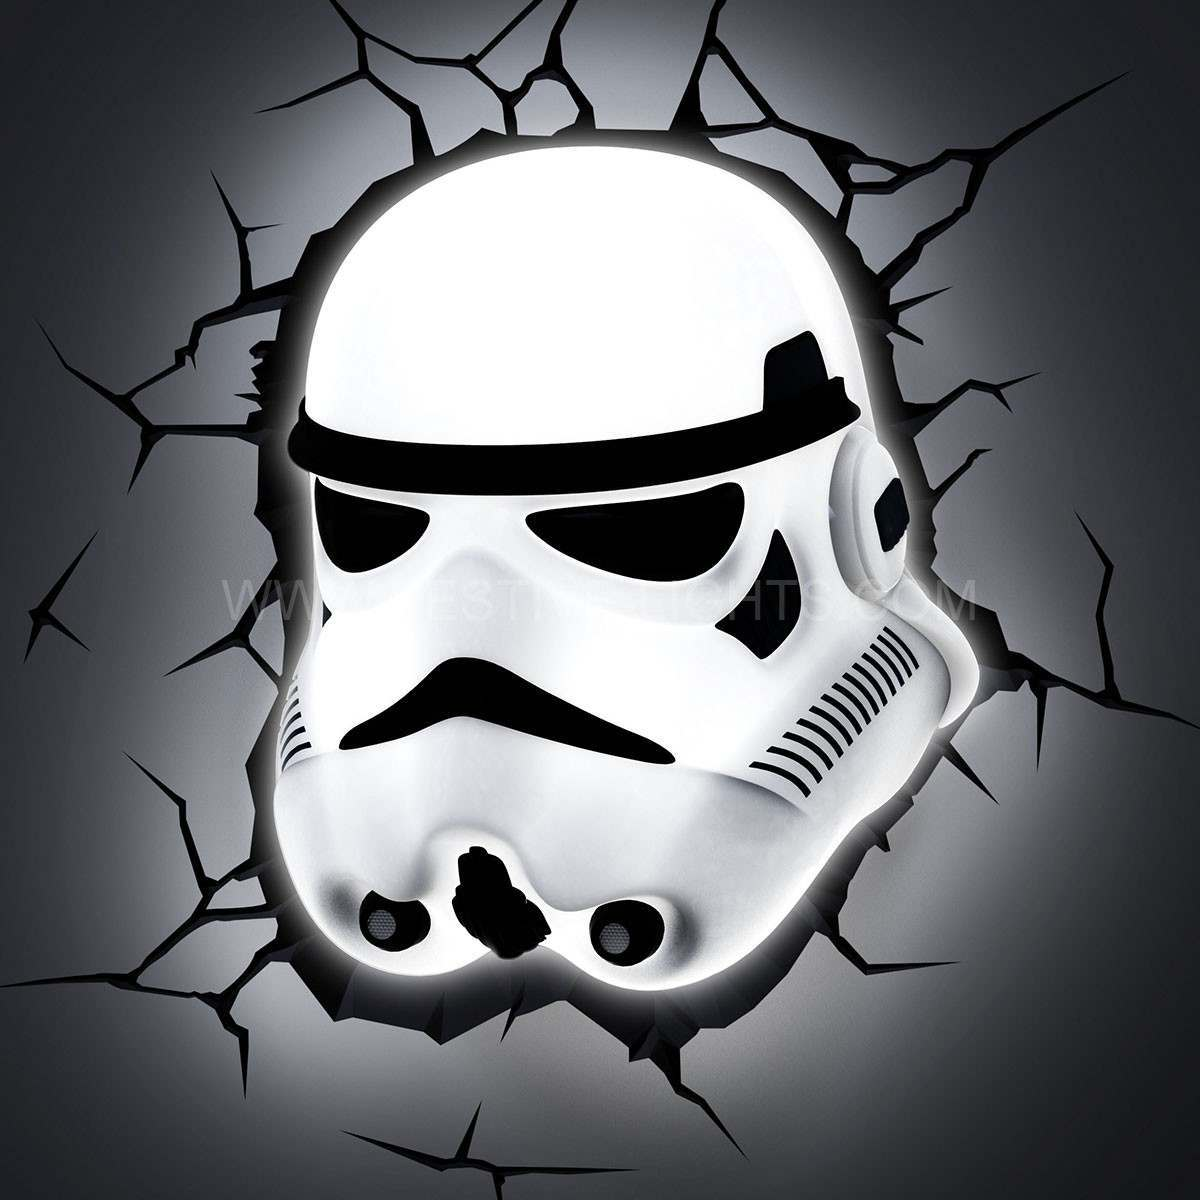 NEW Star Wars Stormtrooper 3D LED Battery Wall Deco Night Light